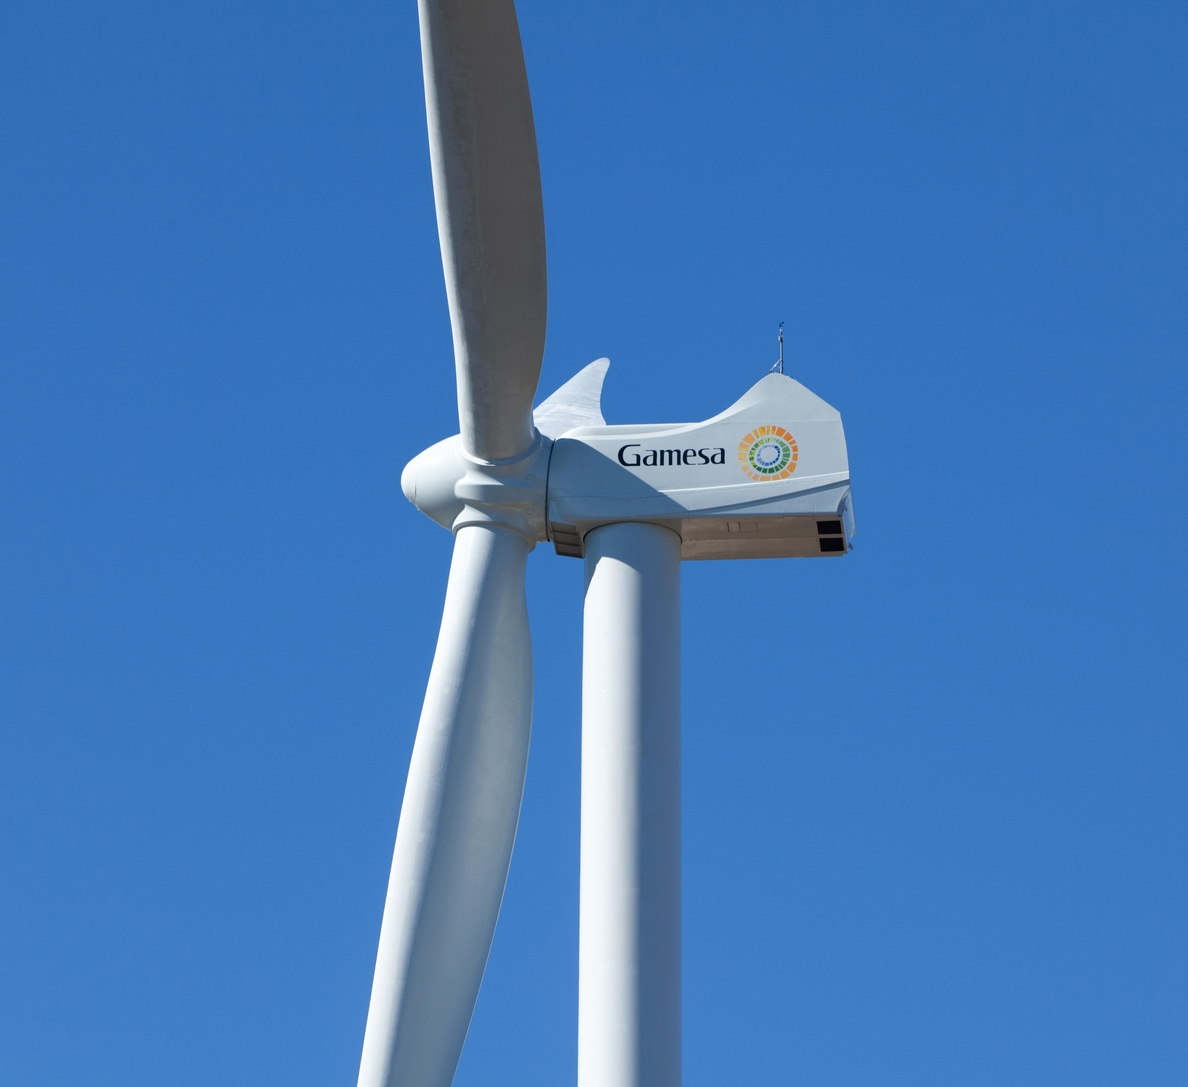 Gamesa suministrará 96 aerogeneradores a ScottishPower, filial británica de Iberdrola